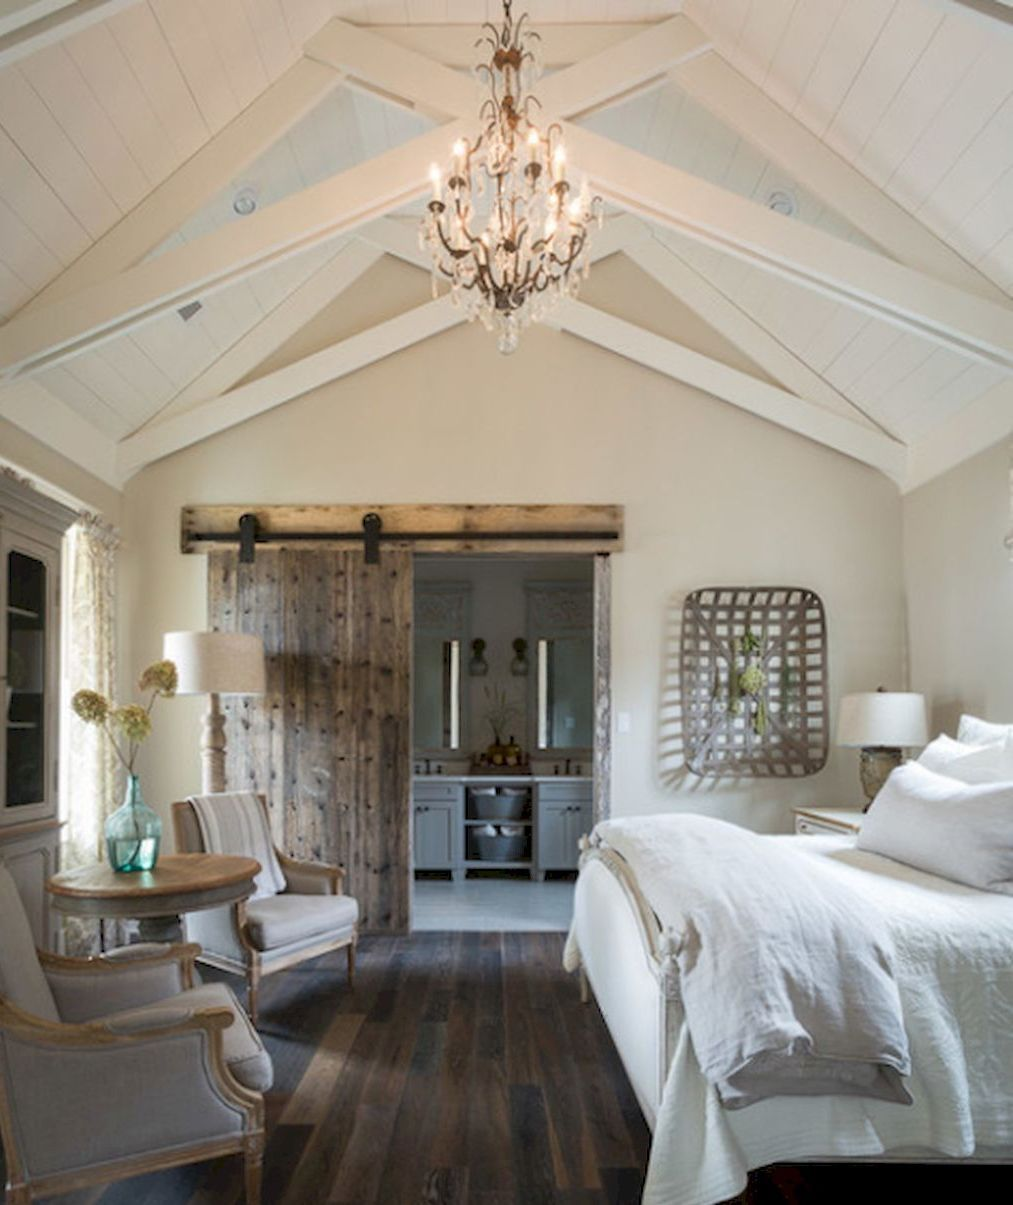 15 Awesome Rustic Farmhouse Bedroom Decor Ideas